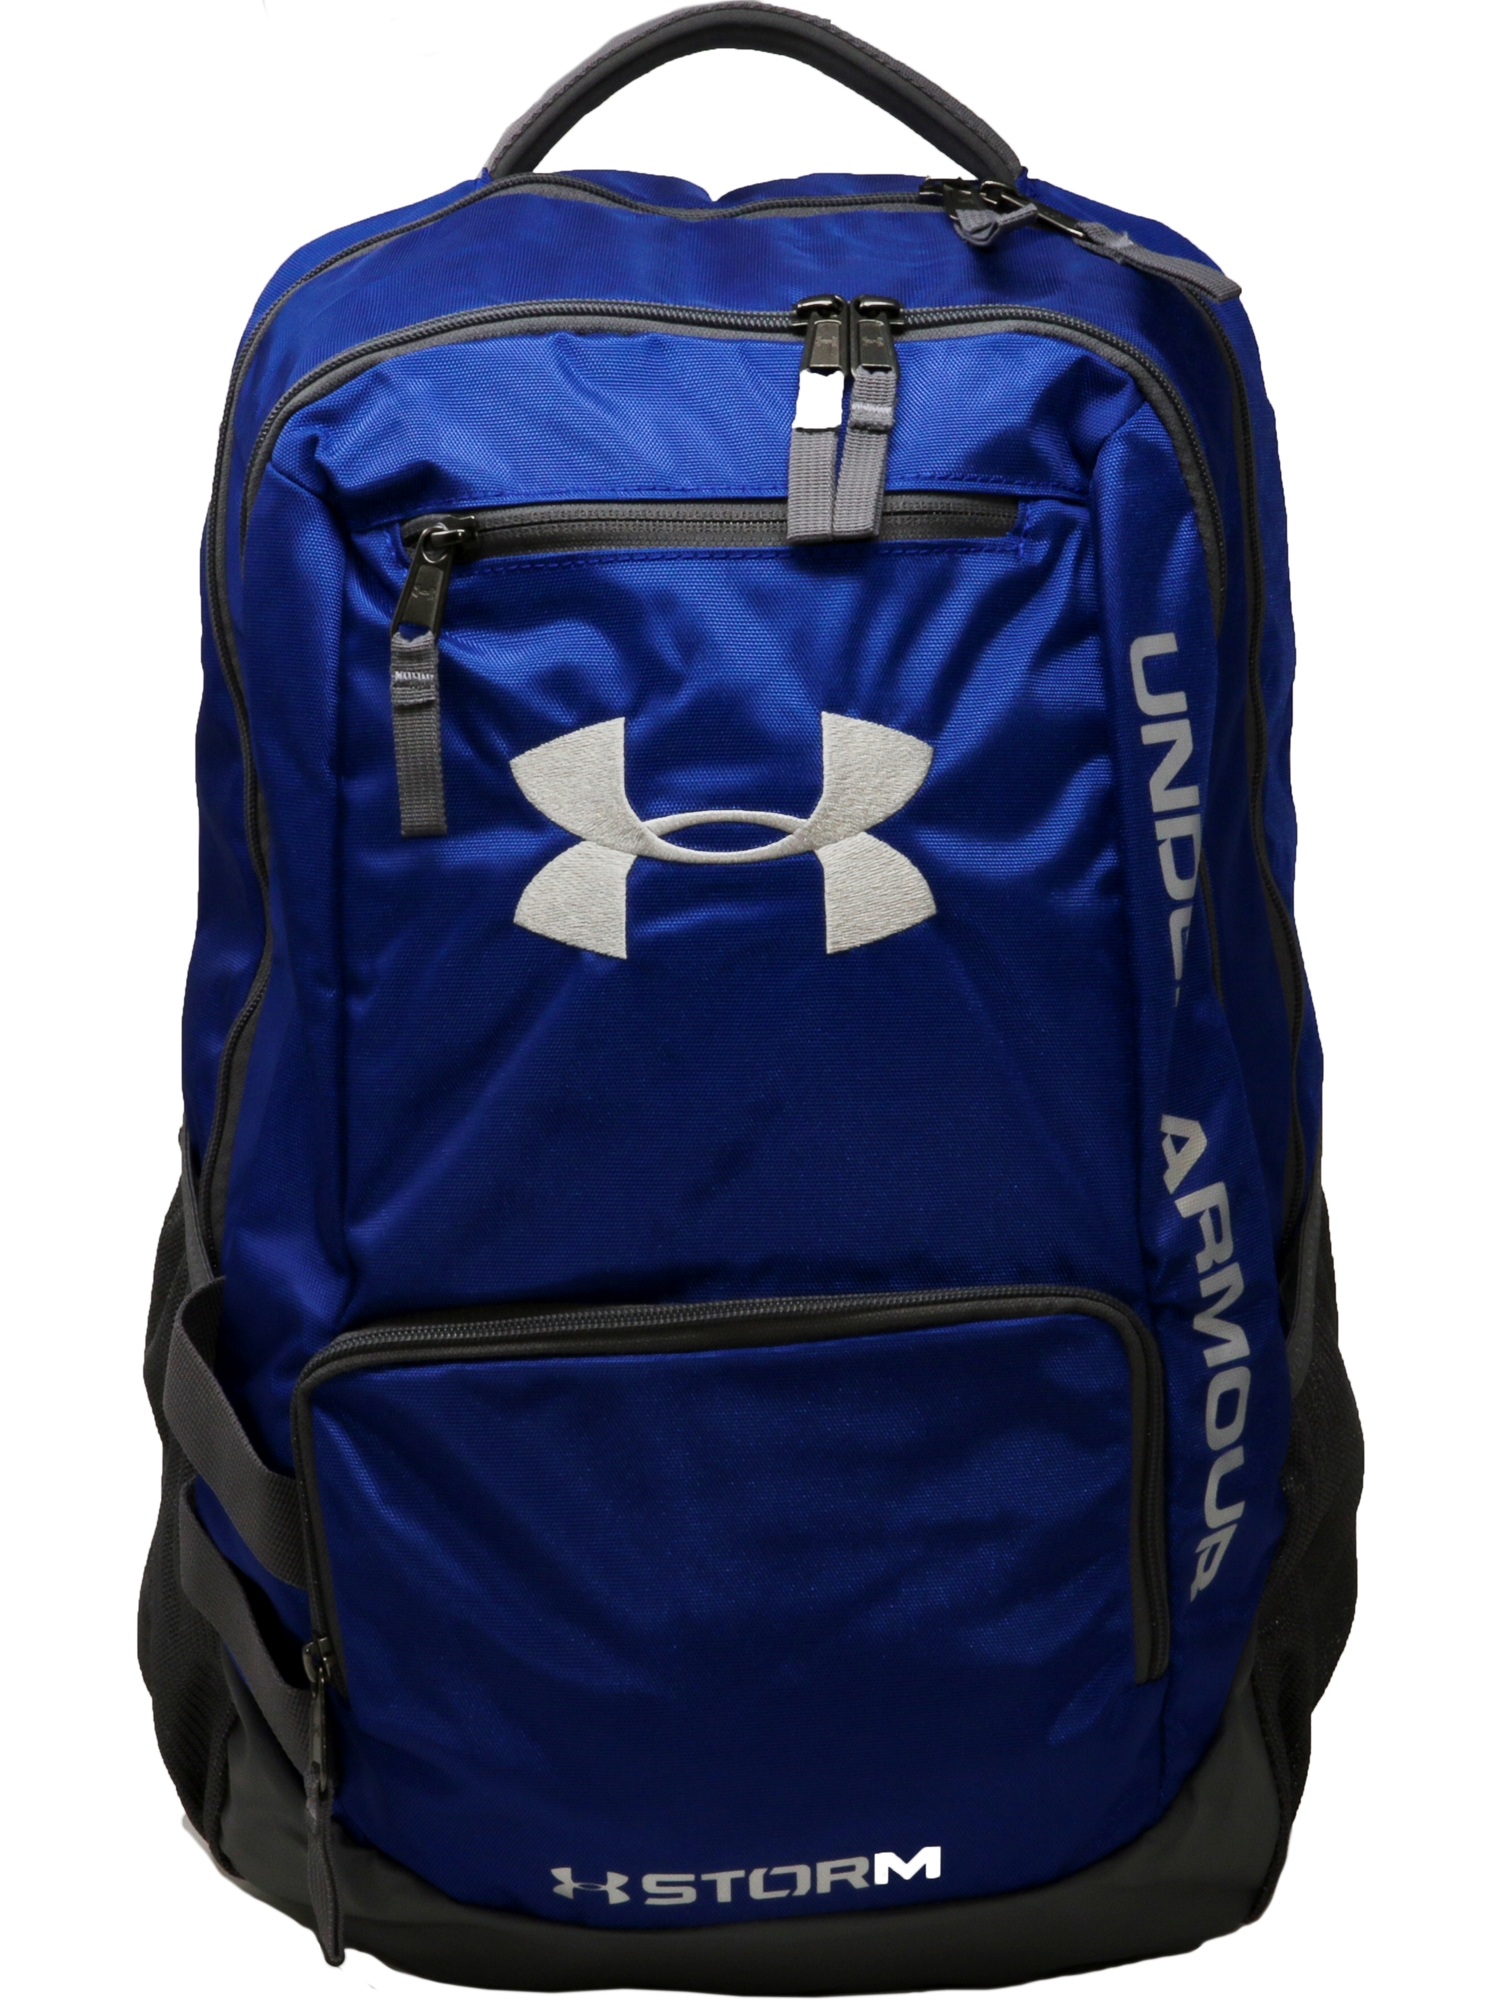 Under Armour - Team Hustle Polyester Backpack - Midnight Navy   Graphite -  Walmart.com 41213c4e34391